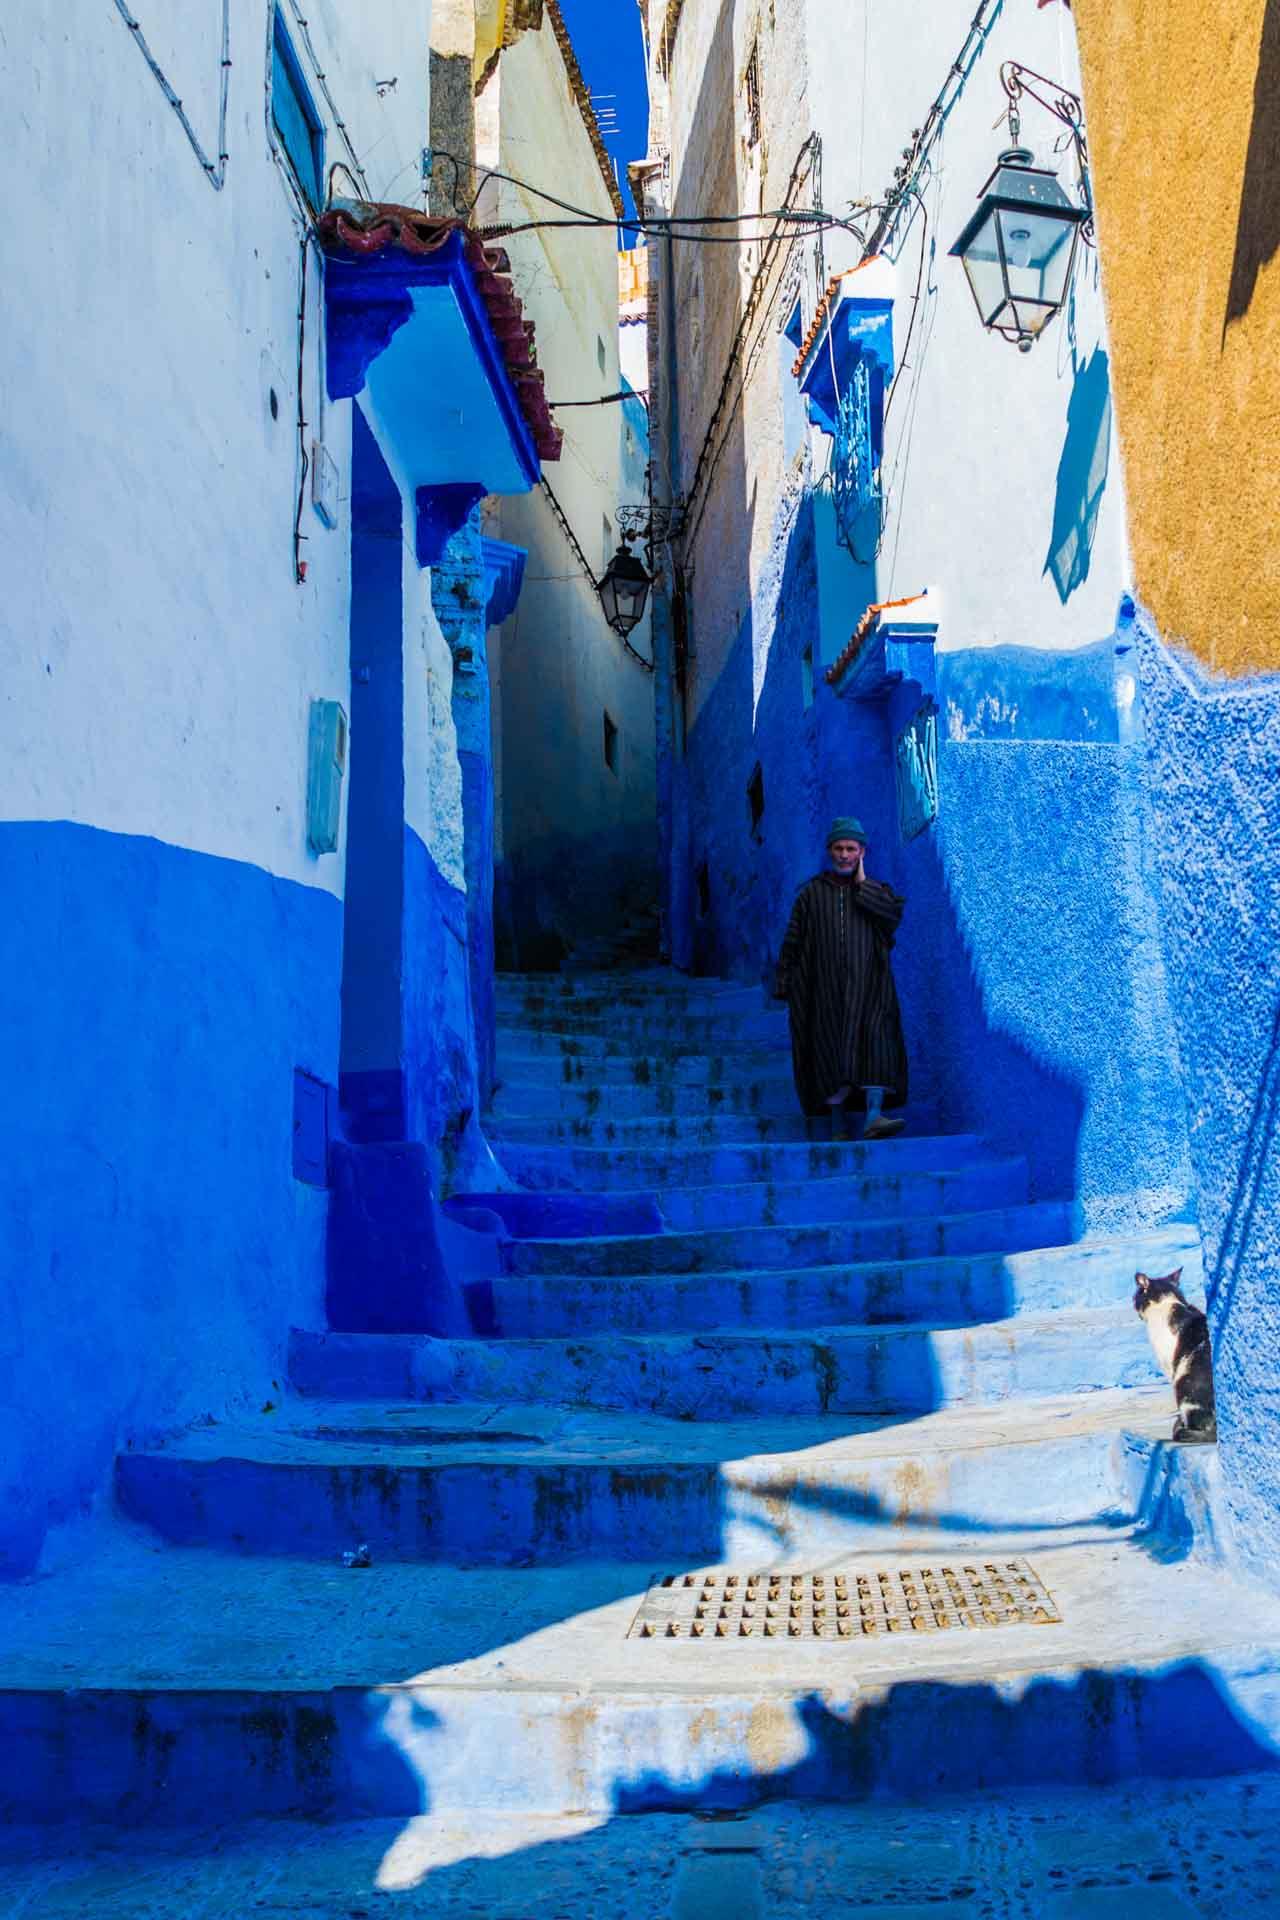 Morocco Chefchaouen blue stairs, morocco, chefchaouen, , pescart, photo blog, travel blog, blog, photo travel blog, enrico pescantini, pescantini